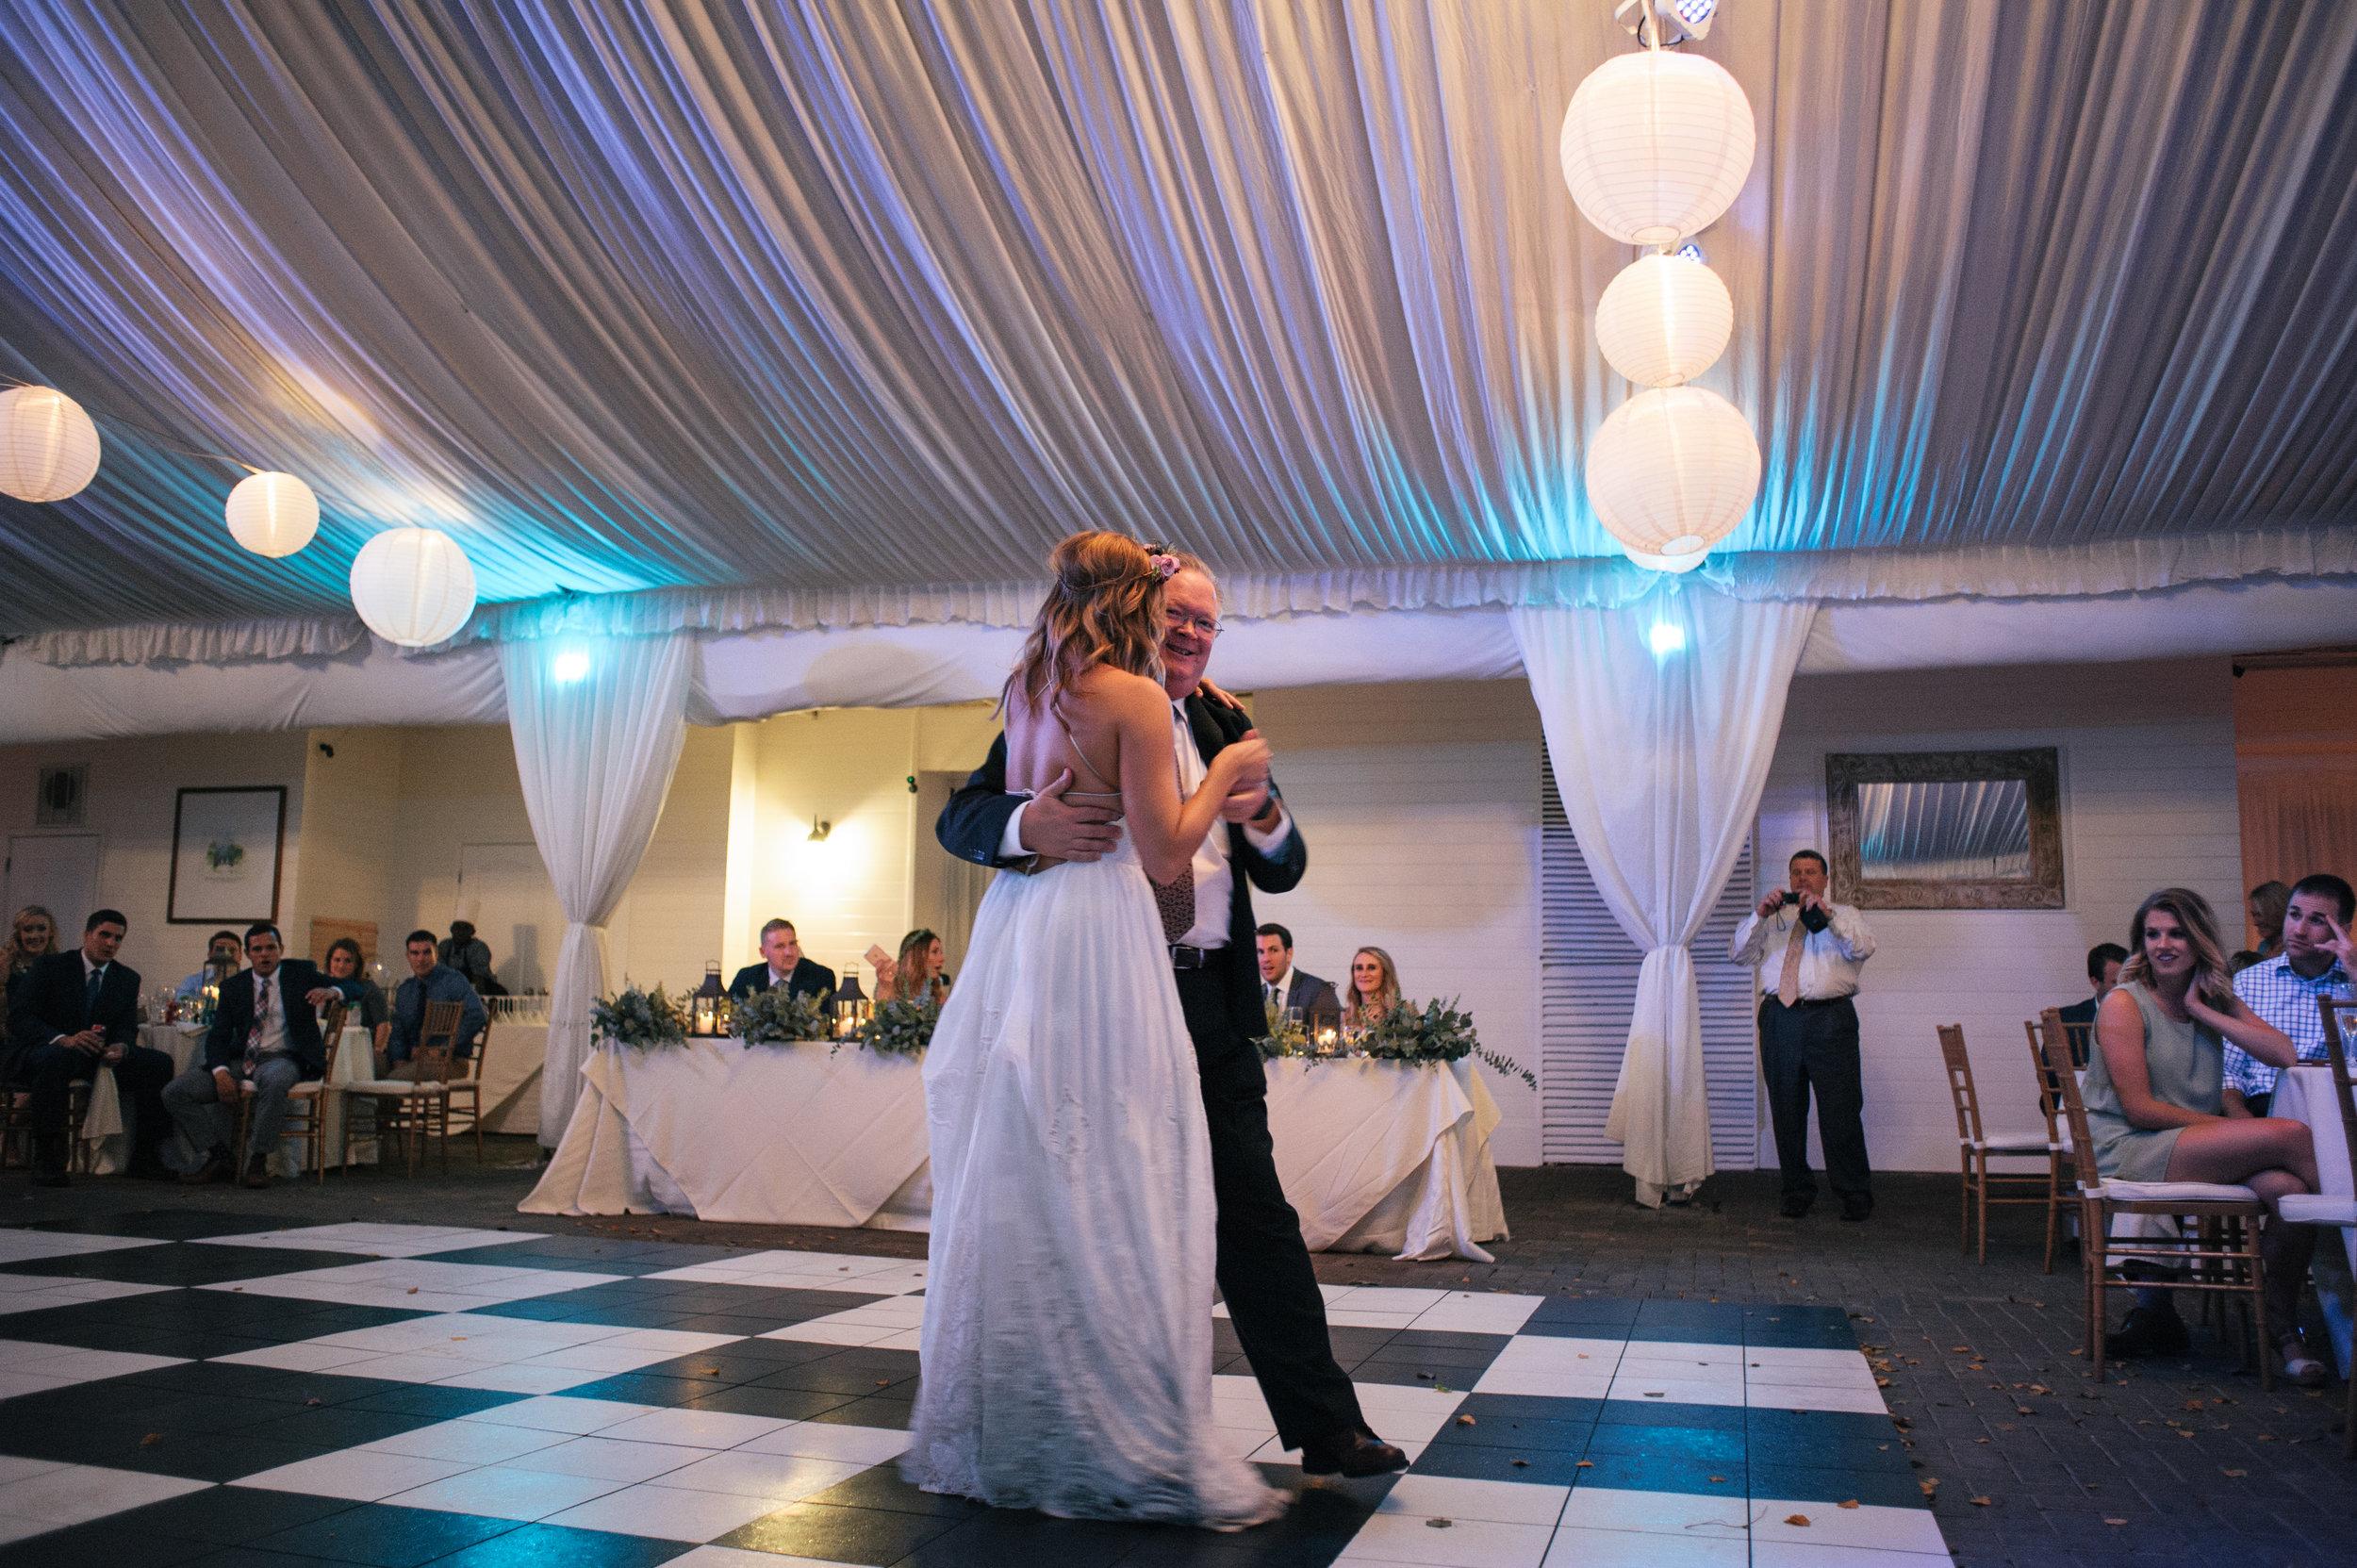 kristin-and-peter-atlanta-georgia-wedding-october-8th-2016 (753 of 1068).jpg